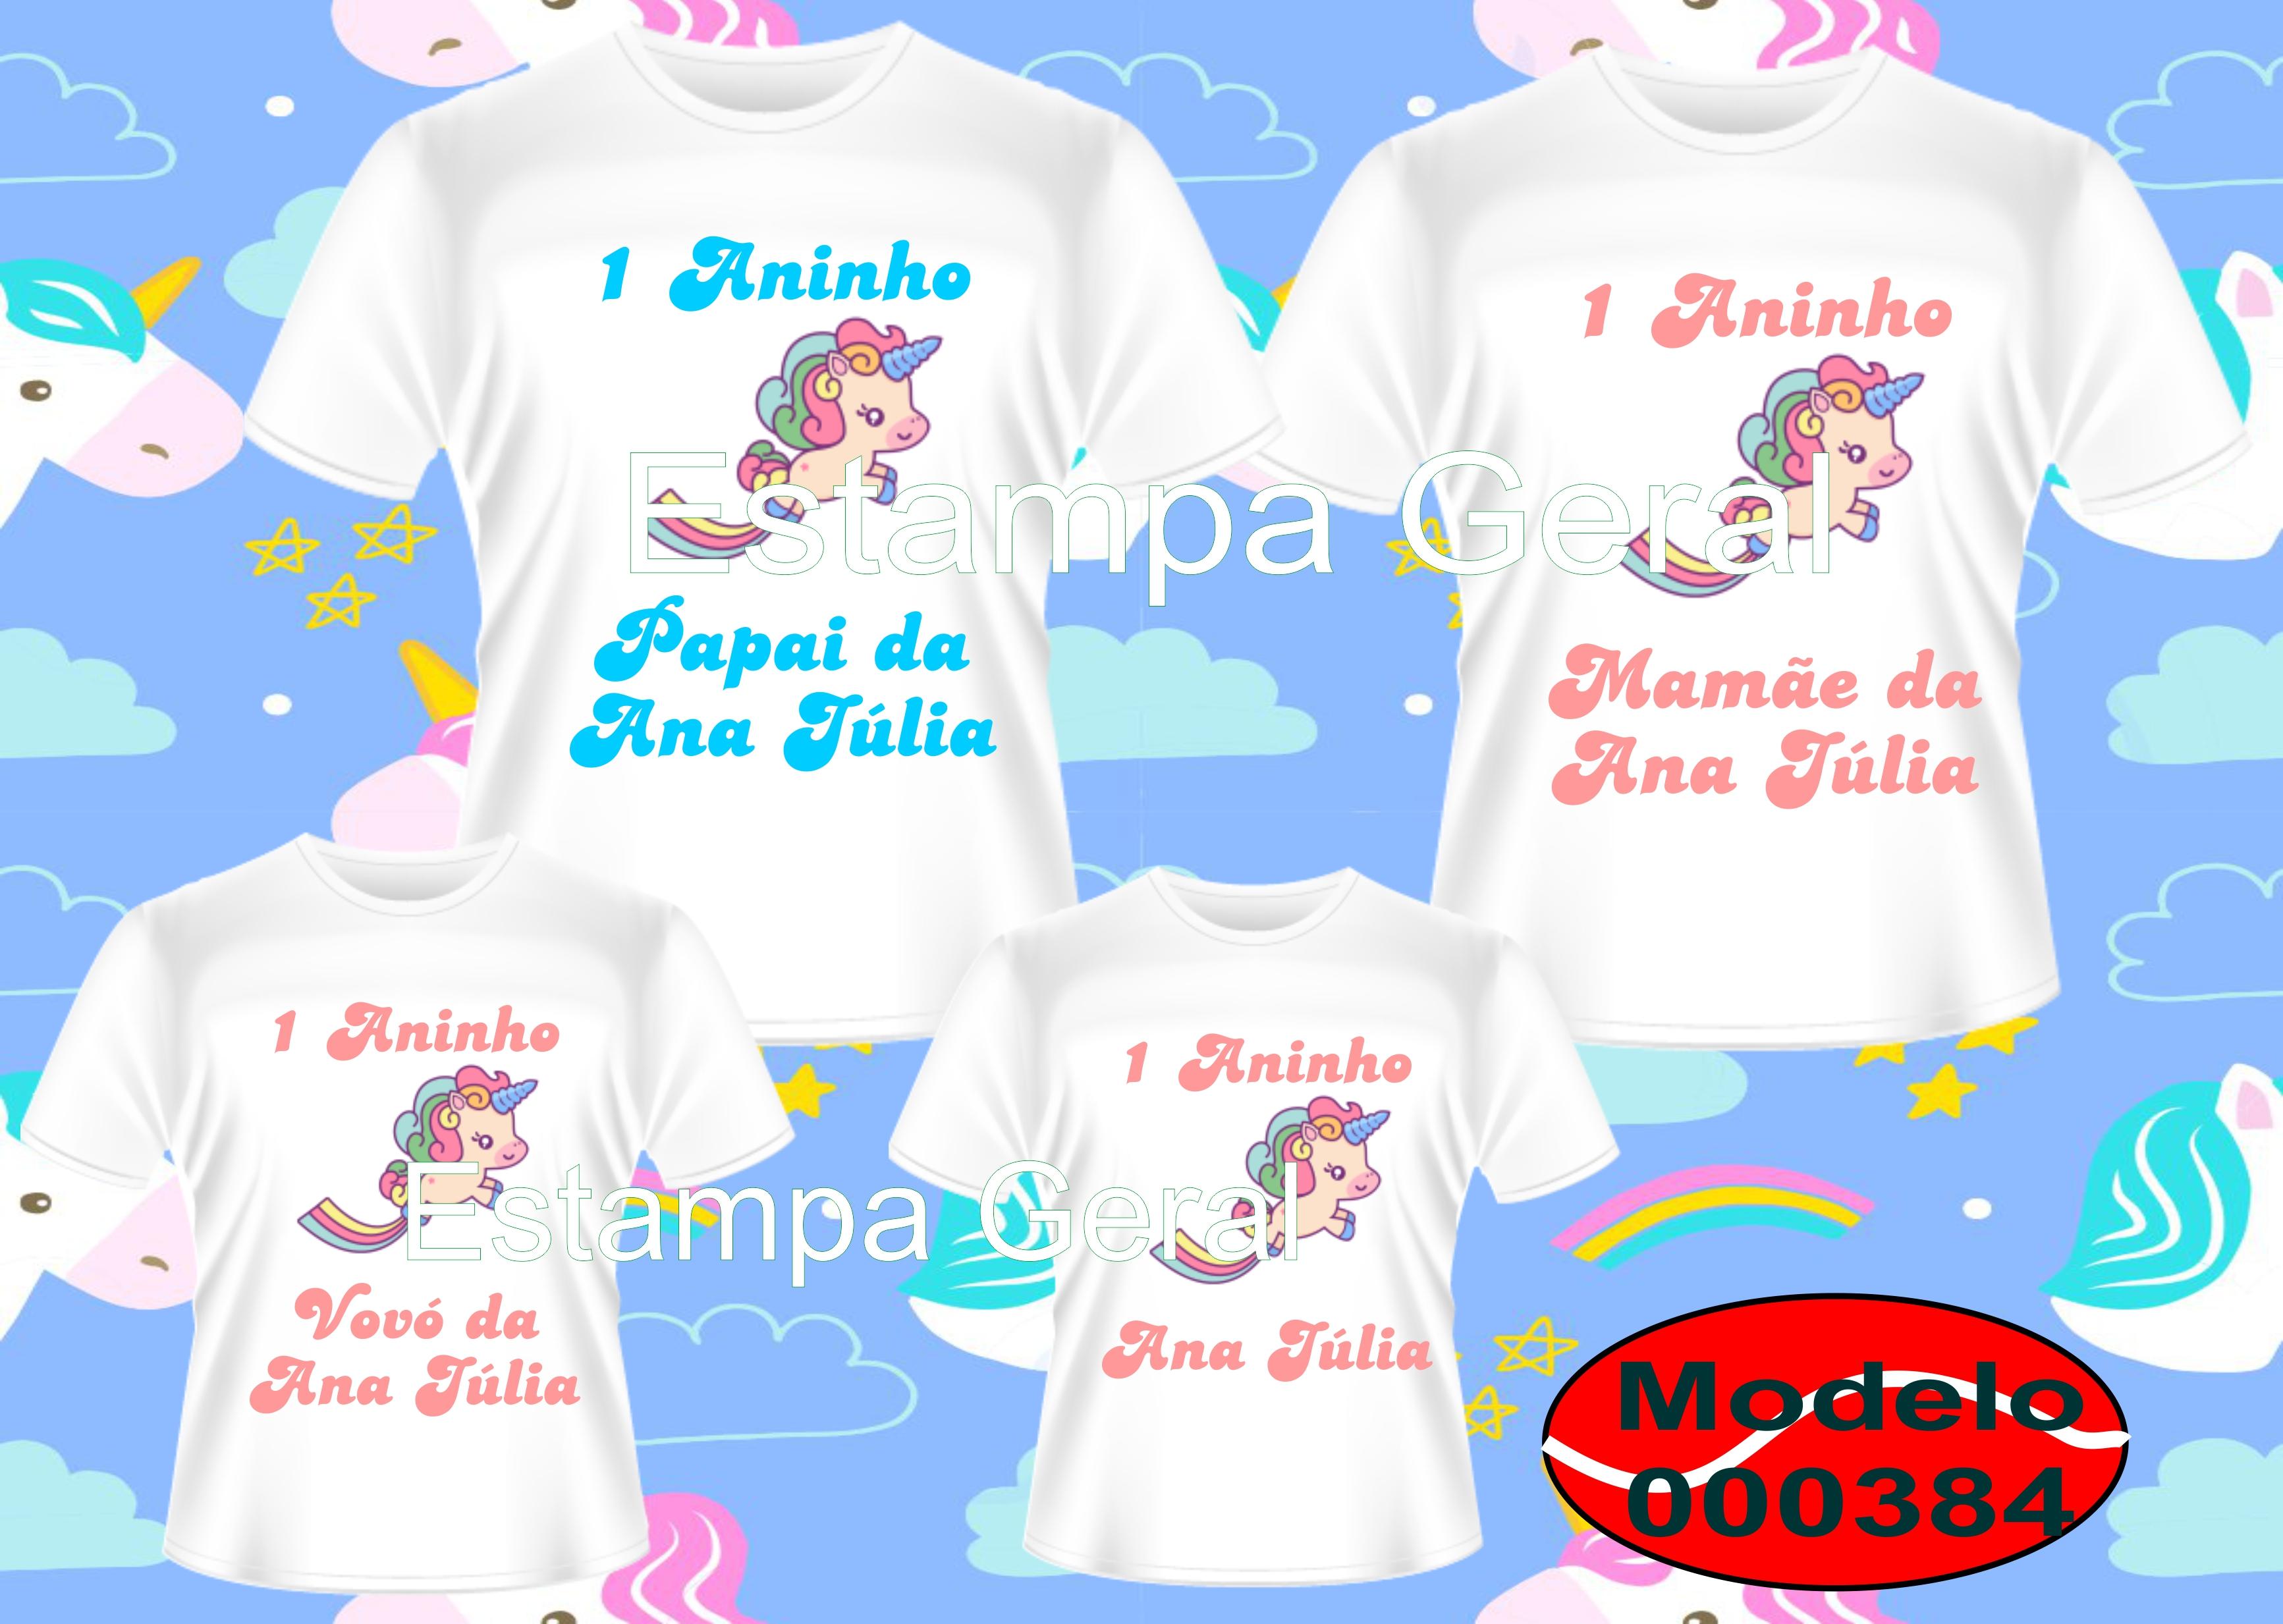 Kit Camiseta Aniversário Tema Unicórnio C4 No Elo7 Estampa Geral